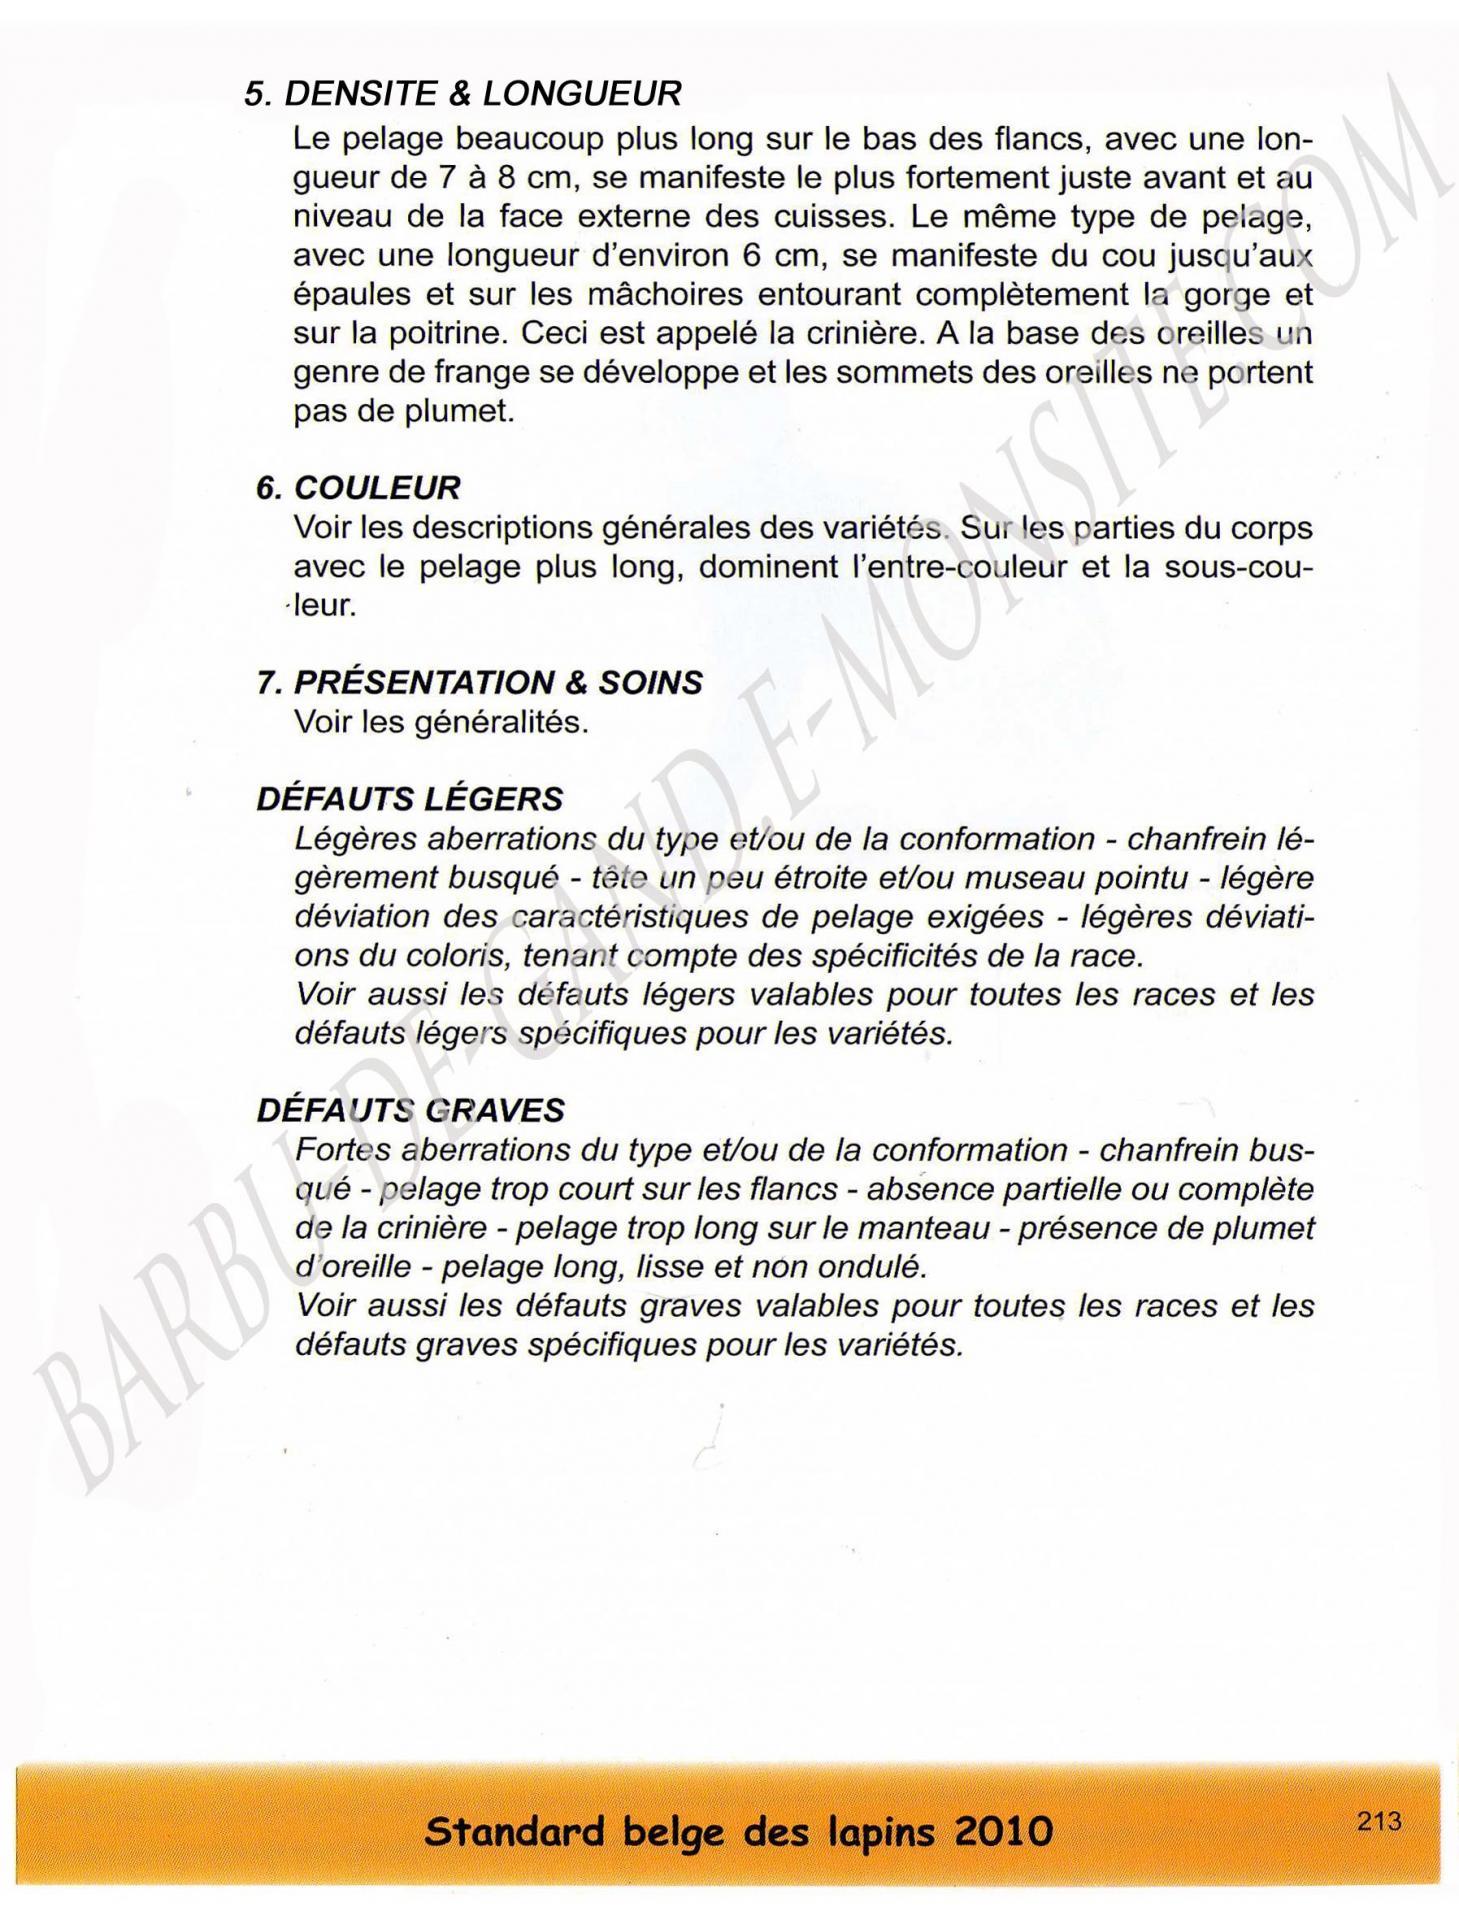 Standard belge 3 filigrane